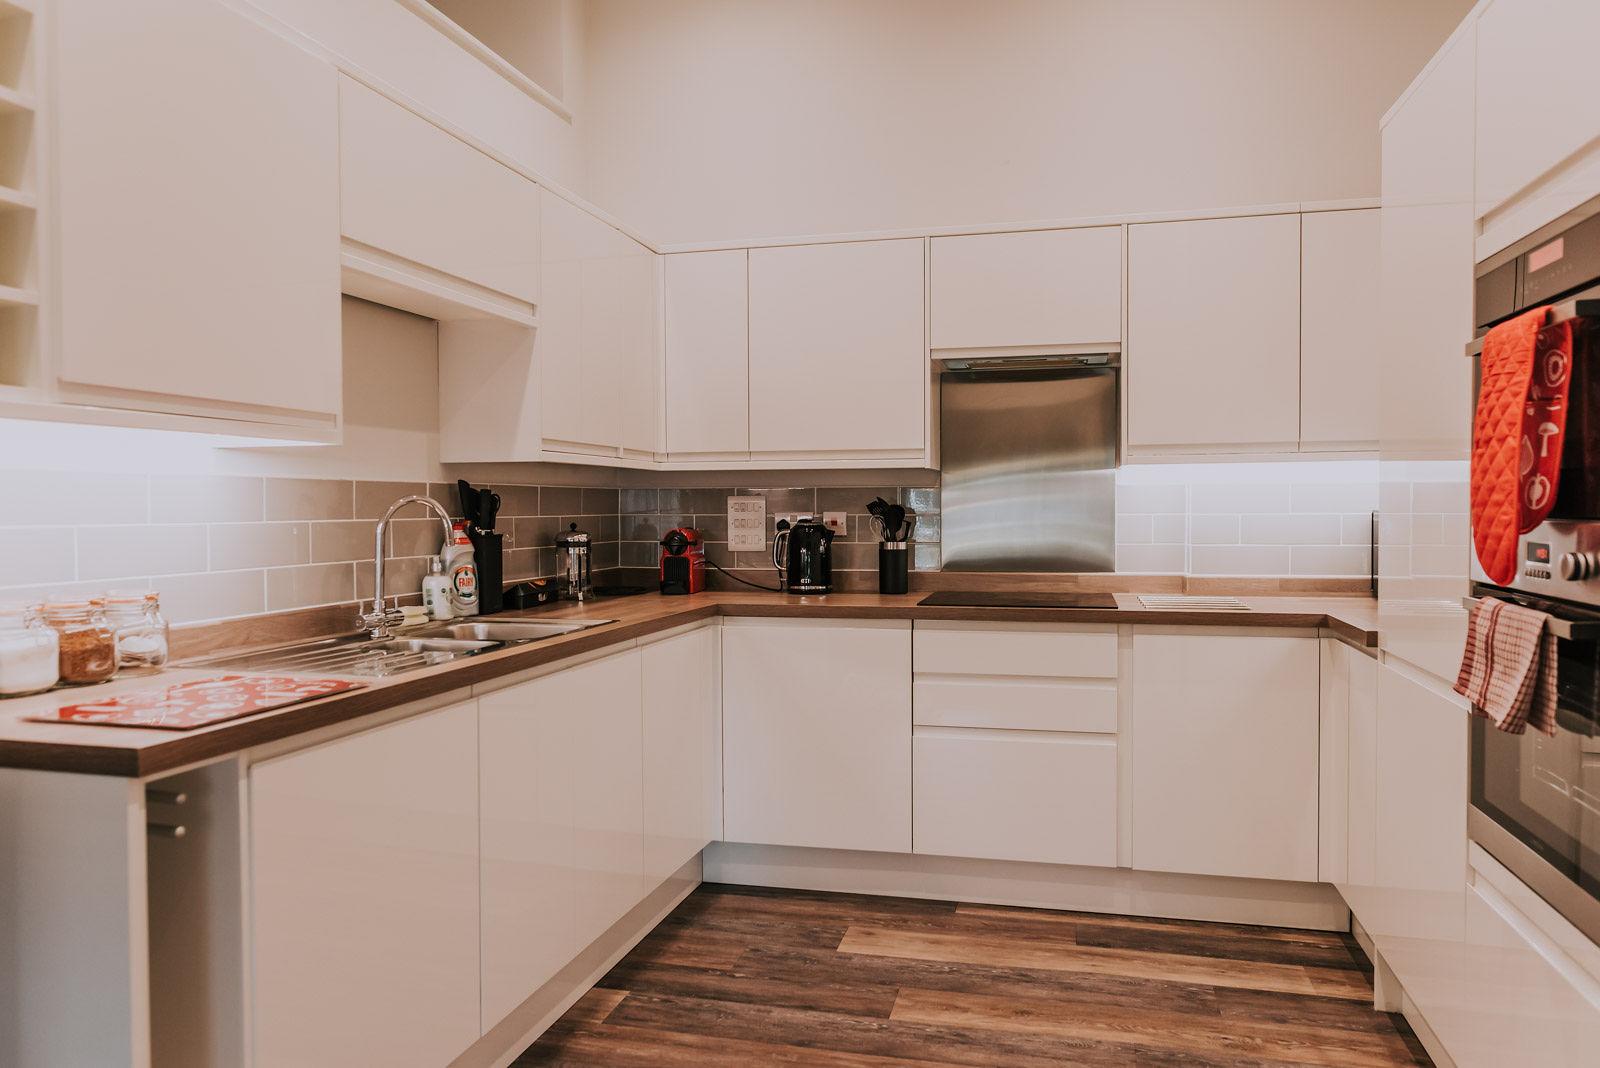 Kitchen at Cavendish House